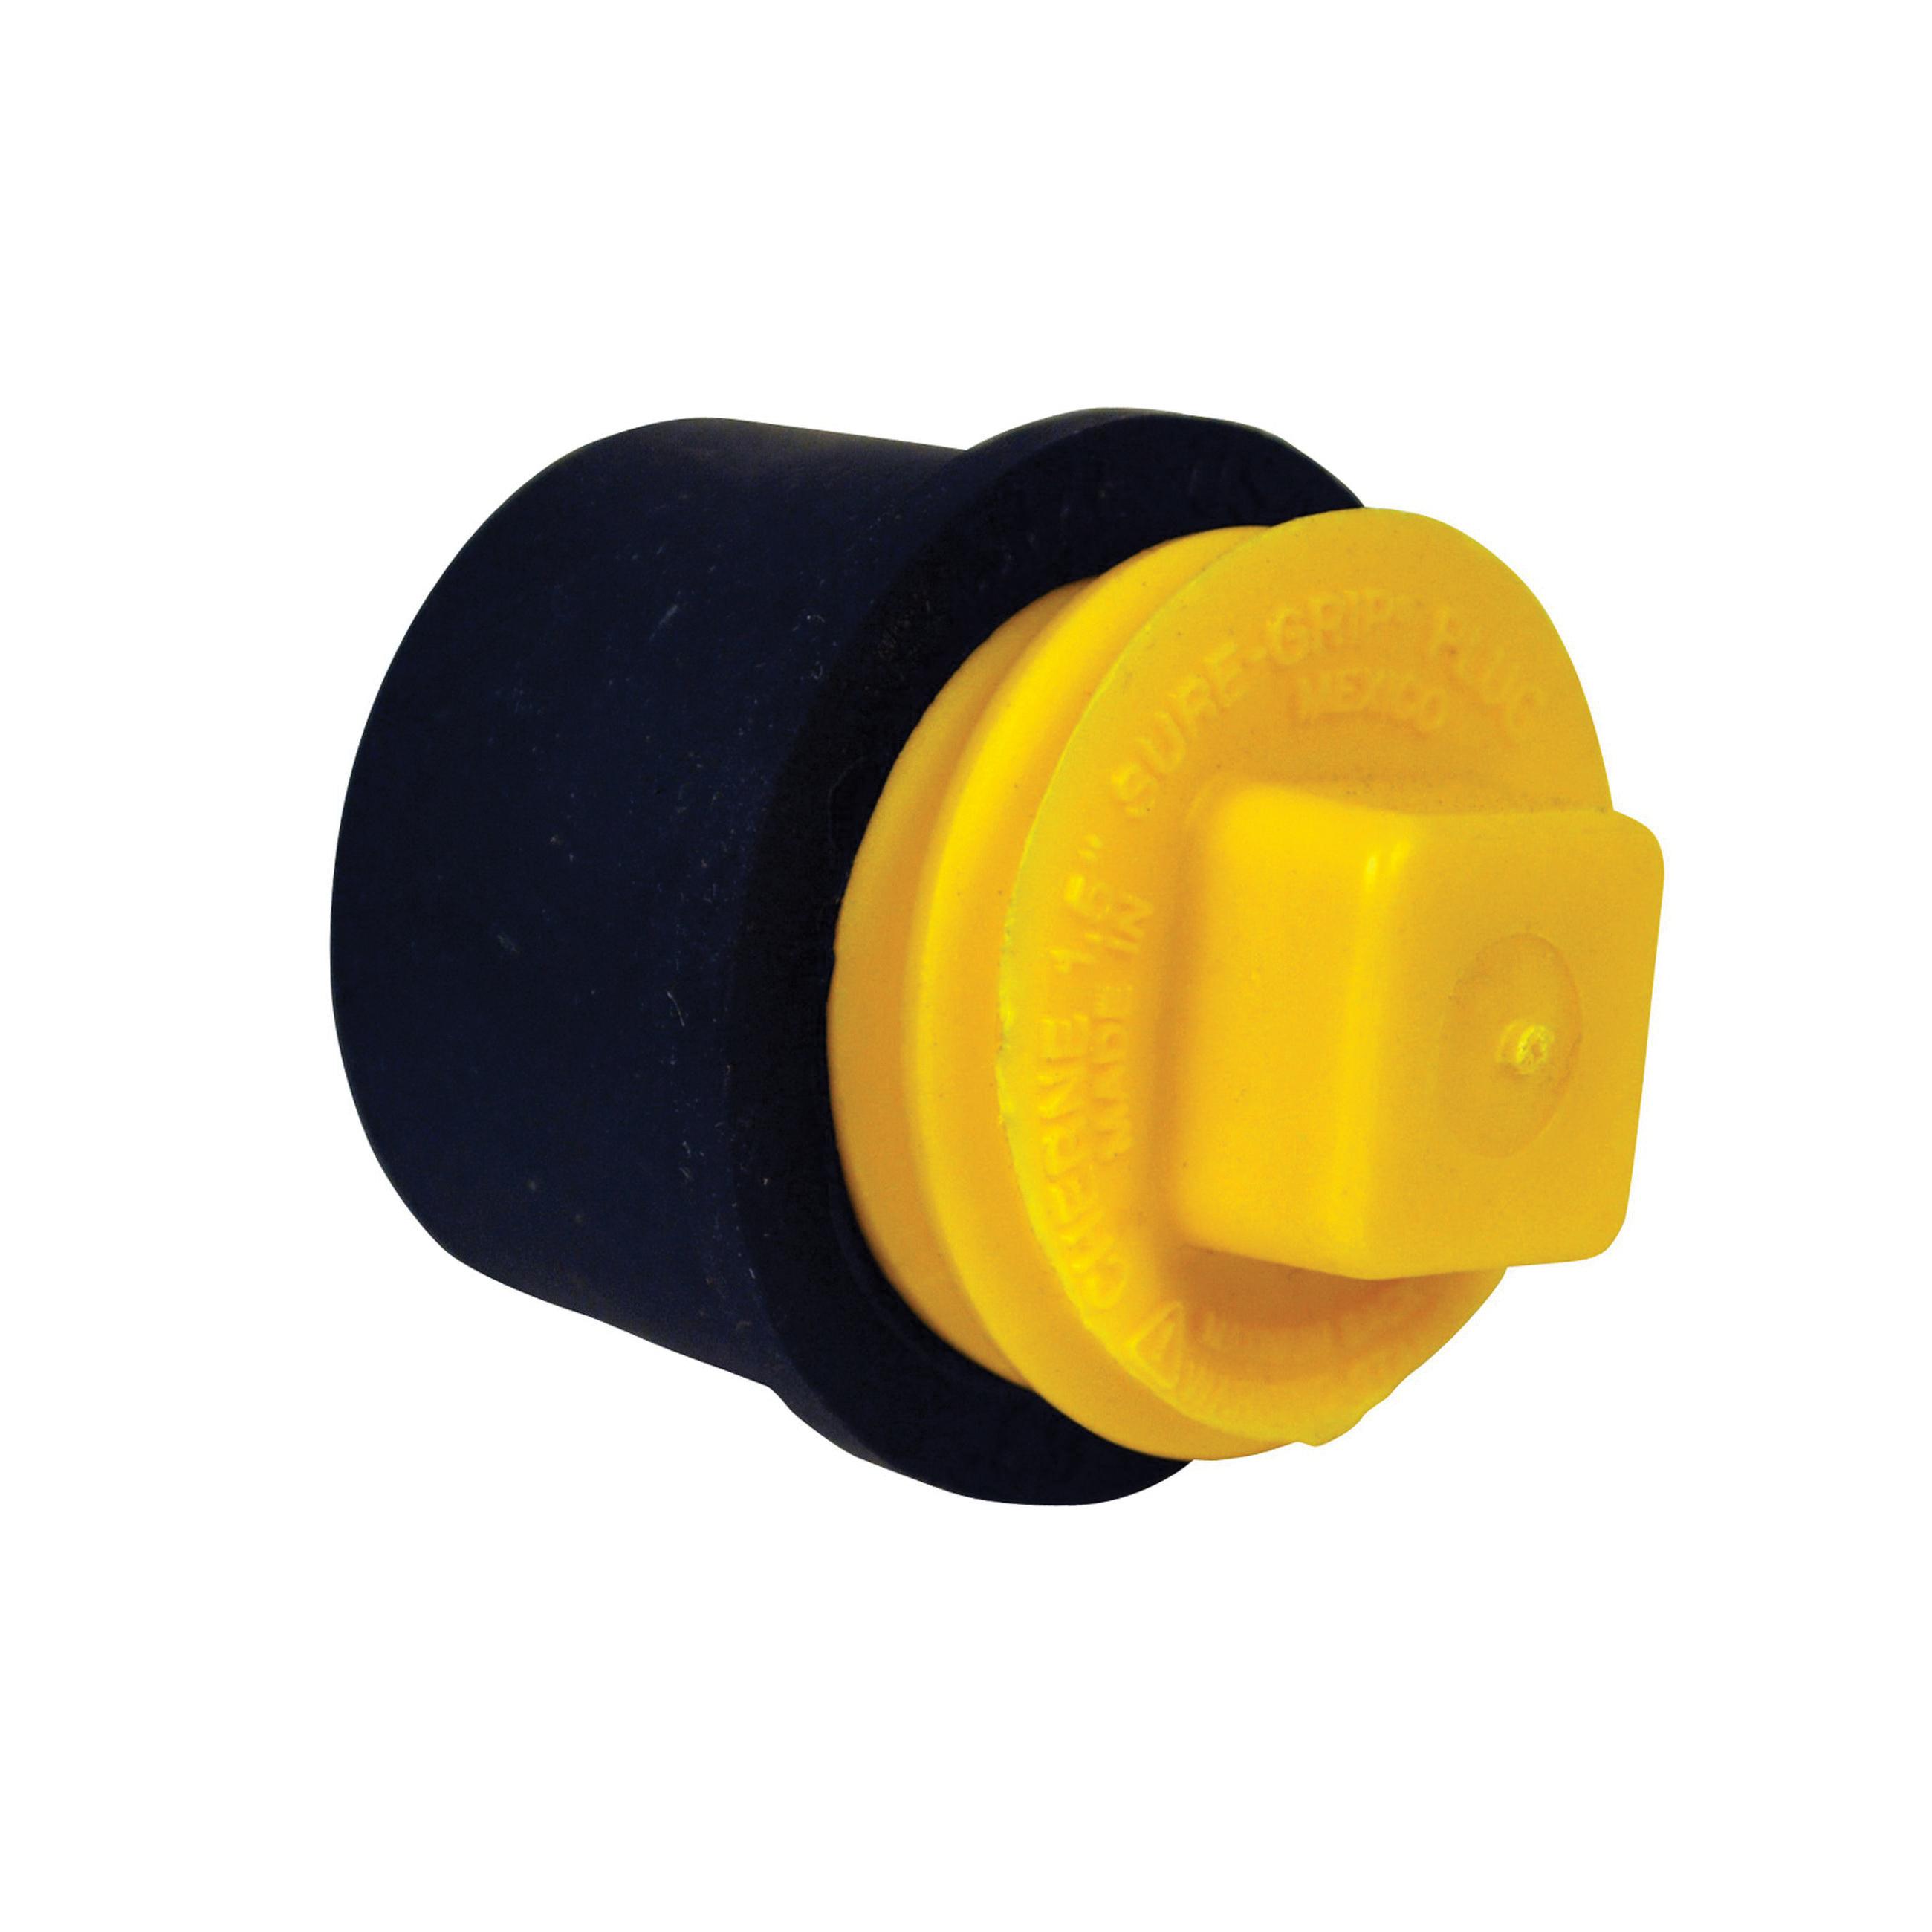 Cherne® Sure-Grip® 271158 Mechanical Pipe Plug, 1-1/2 in, Polypropylene